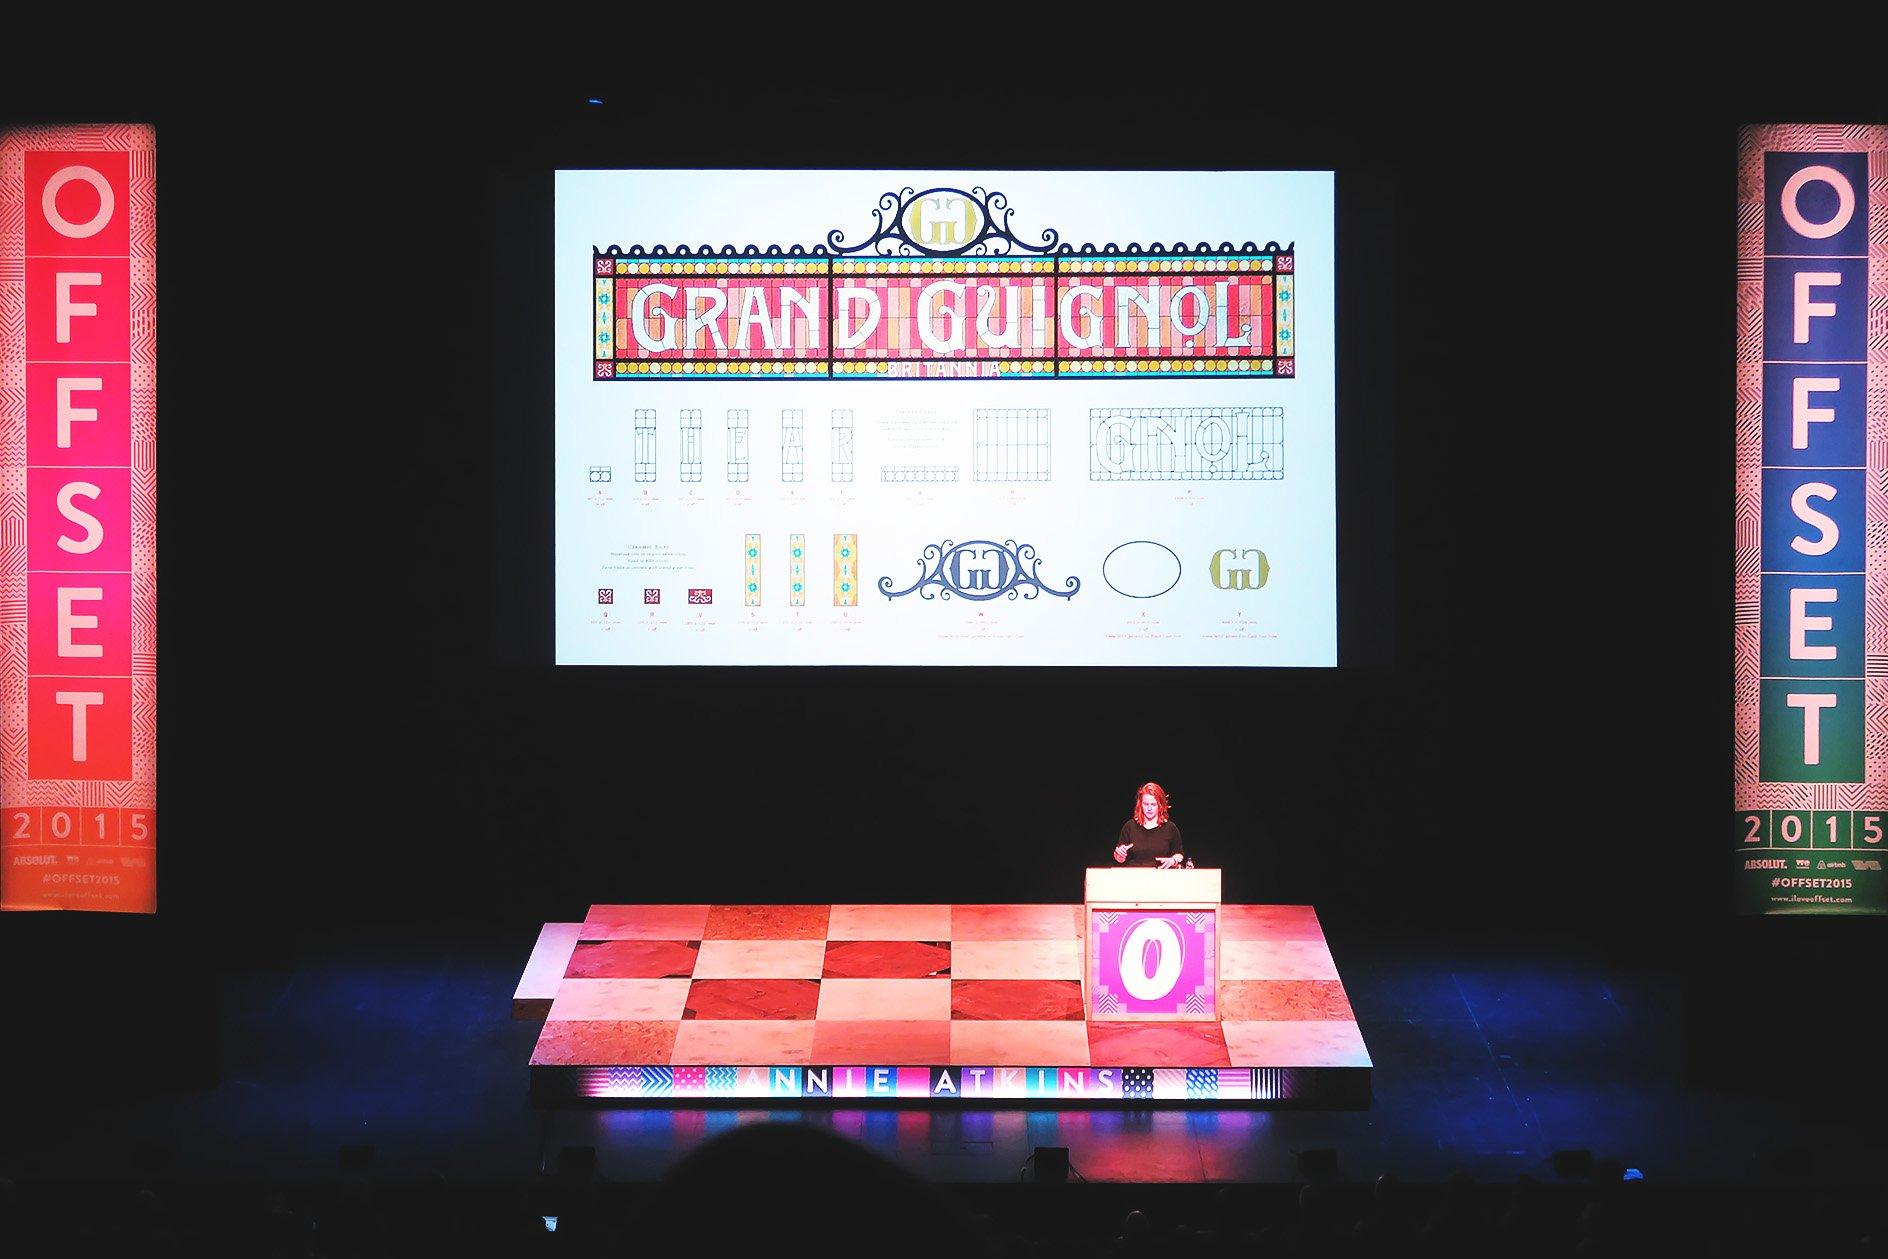 Annie Atkins at OFFSET 2015 – Designing Theatre Signage